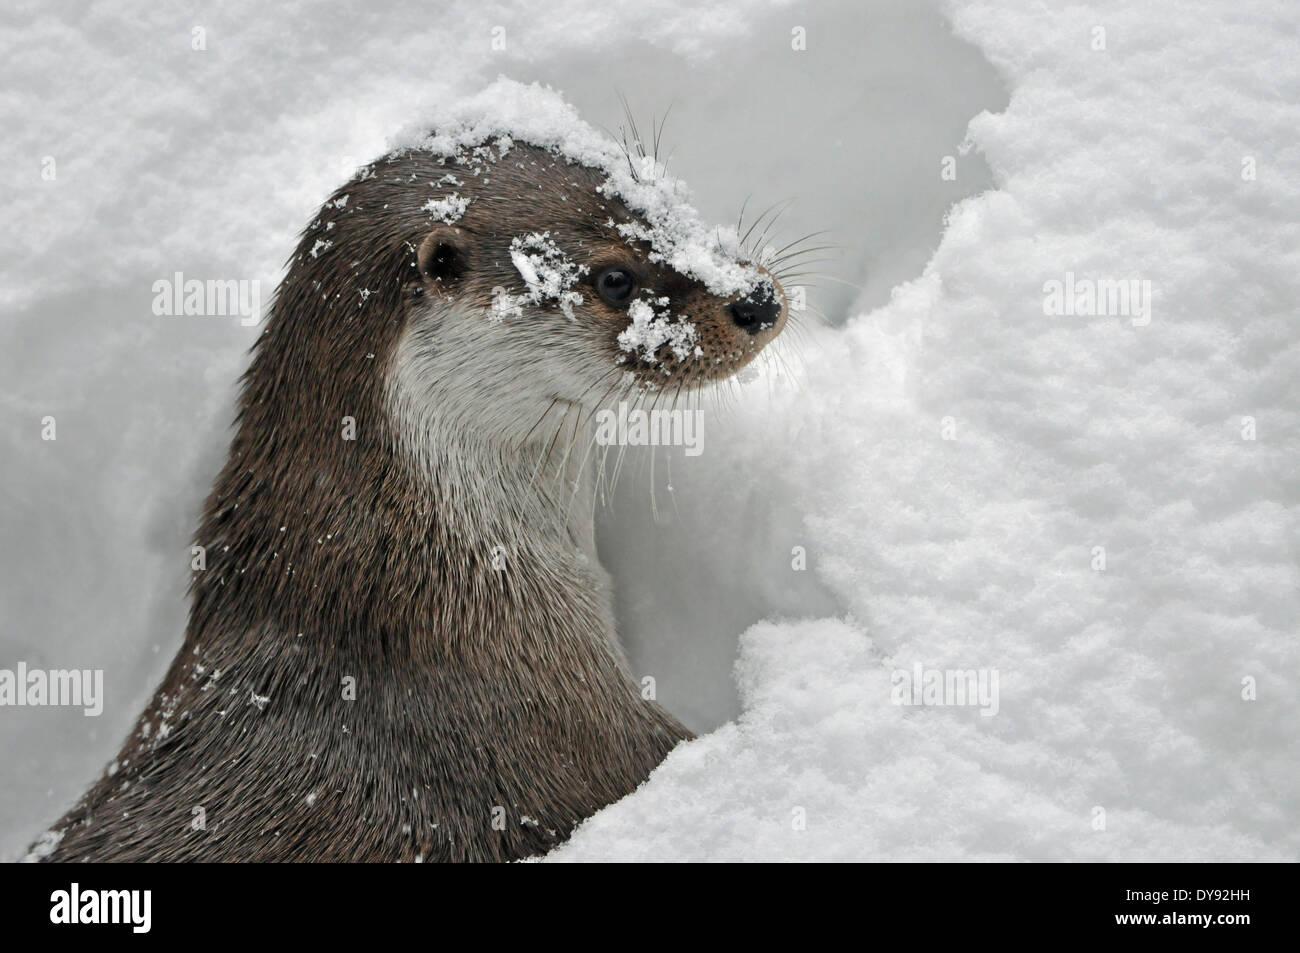 Fischotter Lutra Lutra hairy-nosed Otter Mustelidae Martens Raubtiere Caniden Otter Wasser Predator Fisch Marten Winter Tier anima Stockbild